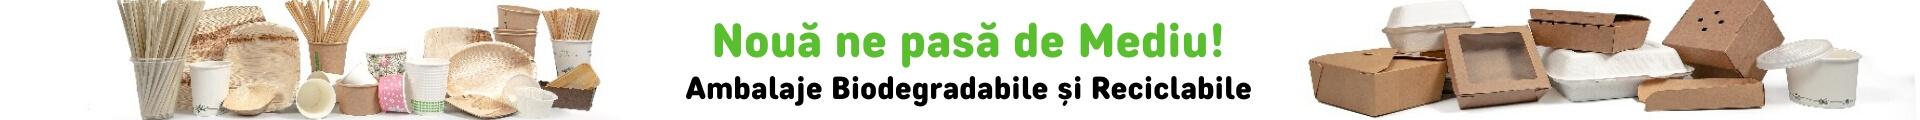 banner ambalaje biodegradabile